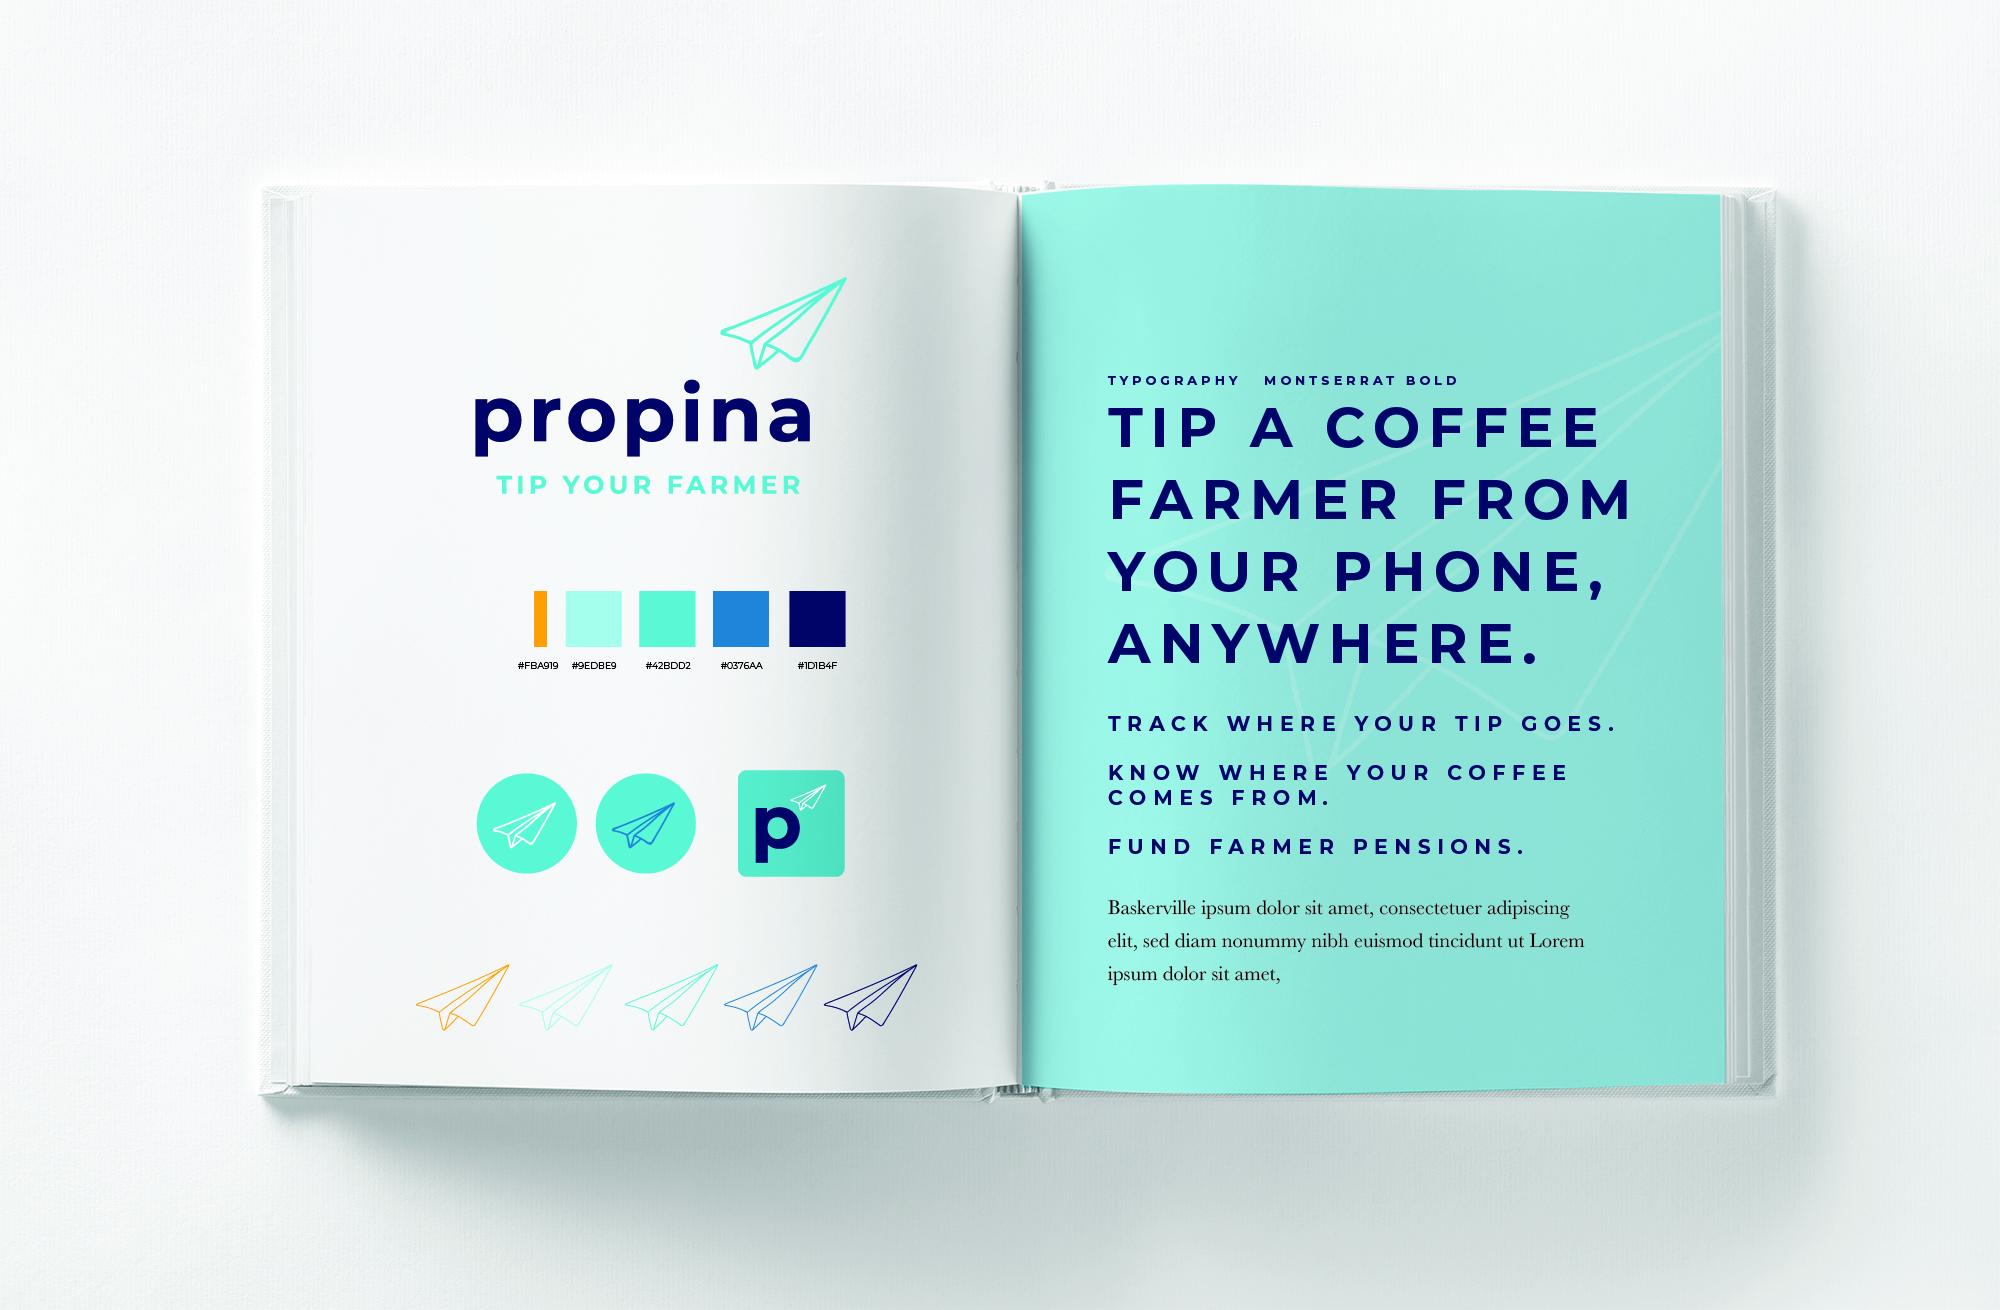 propina-brand-id-book_1.jpg